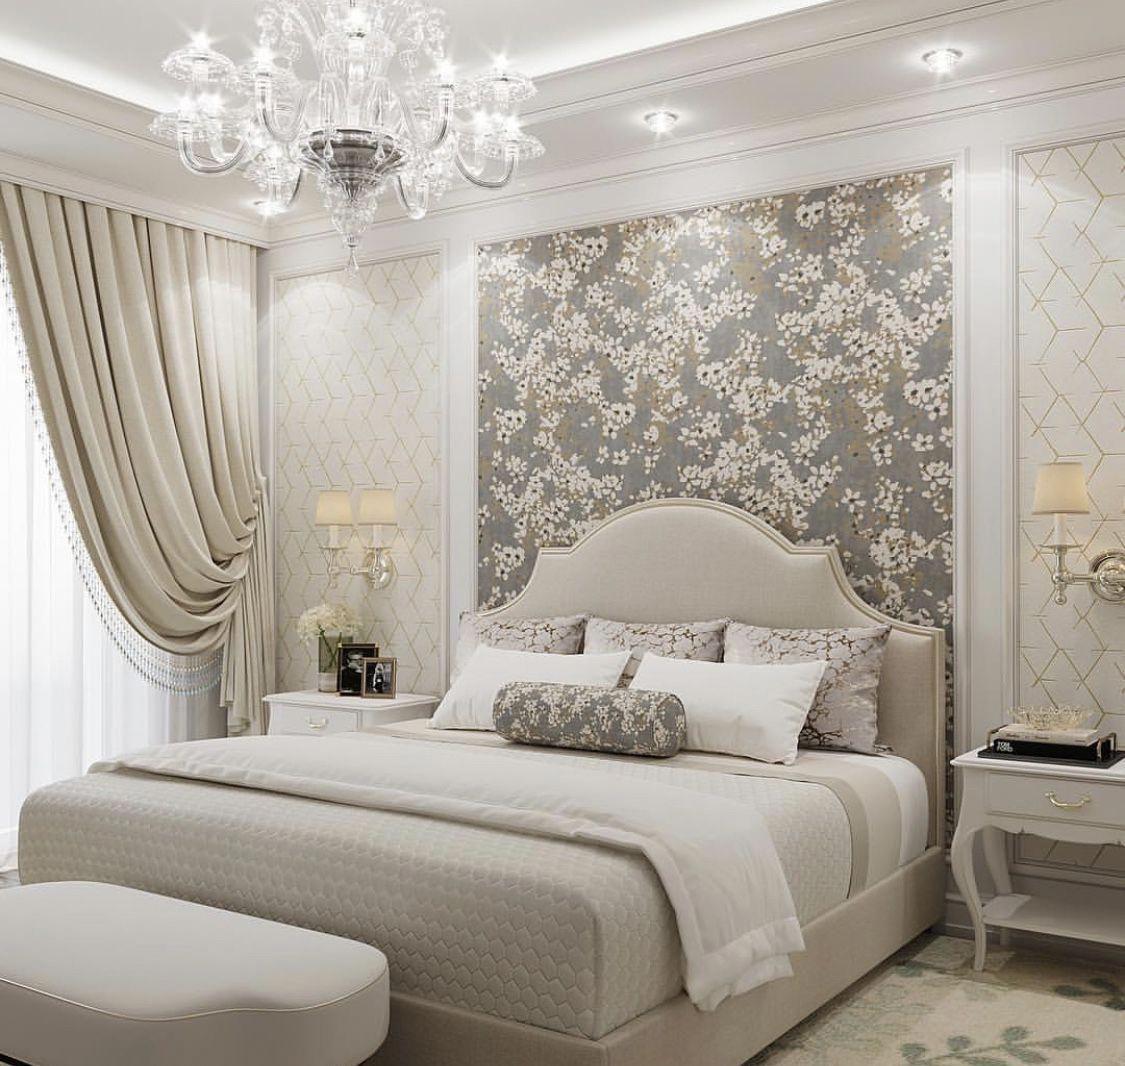 Master Bedroom Decorating Ideas Simple Bedroom Decor Bedroom Decoration Pictures 20190708 Classy Bedroom Elegant Bedroom Decor French Bedroom Decor Beige bedroom decorating ideas